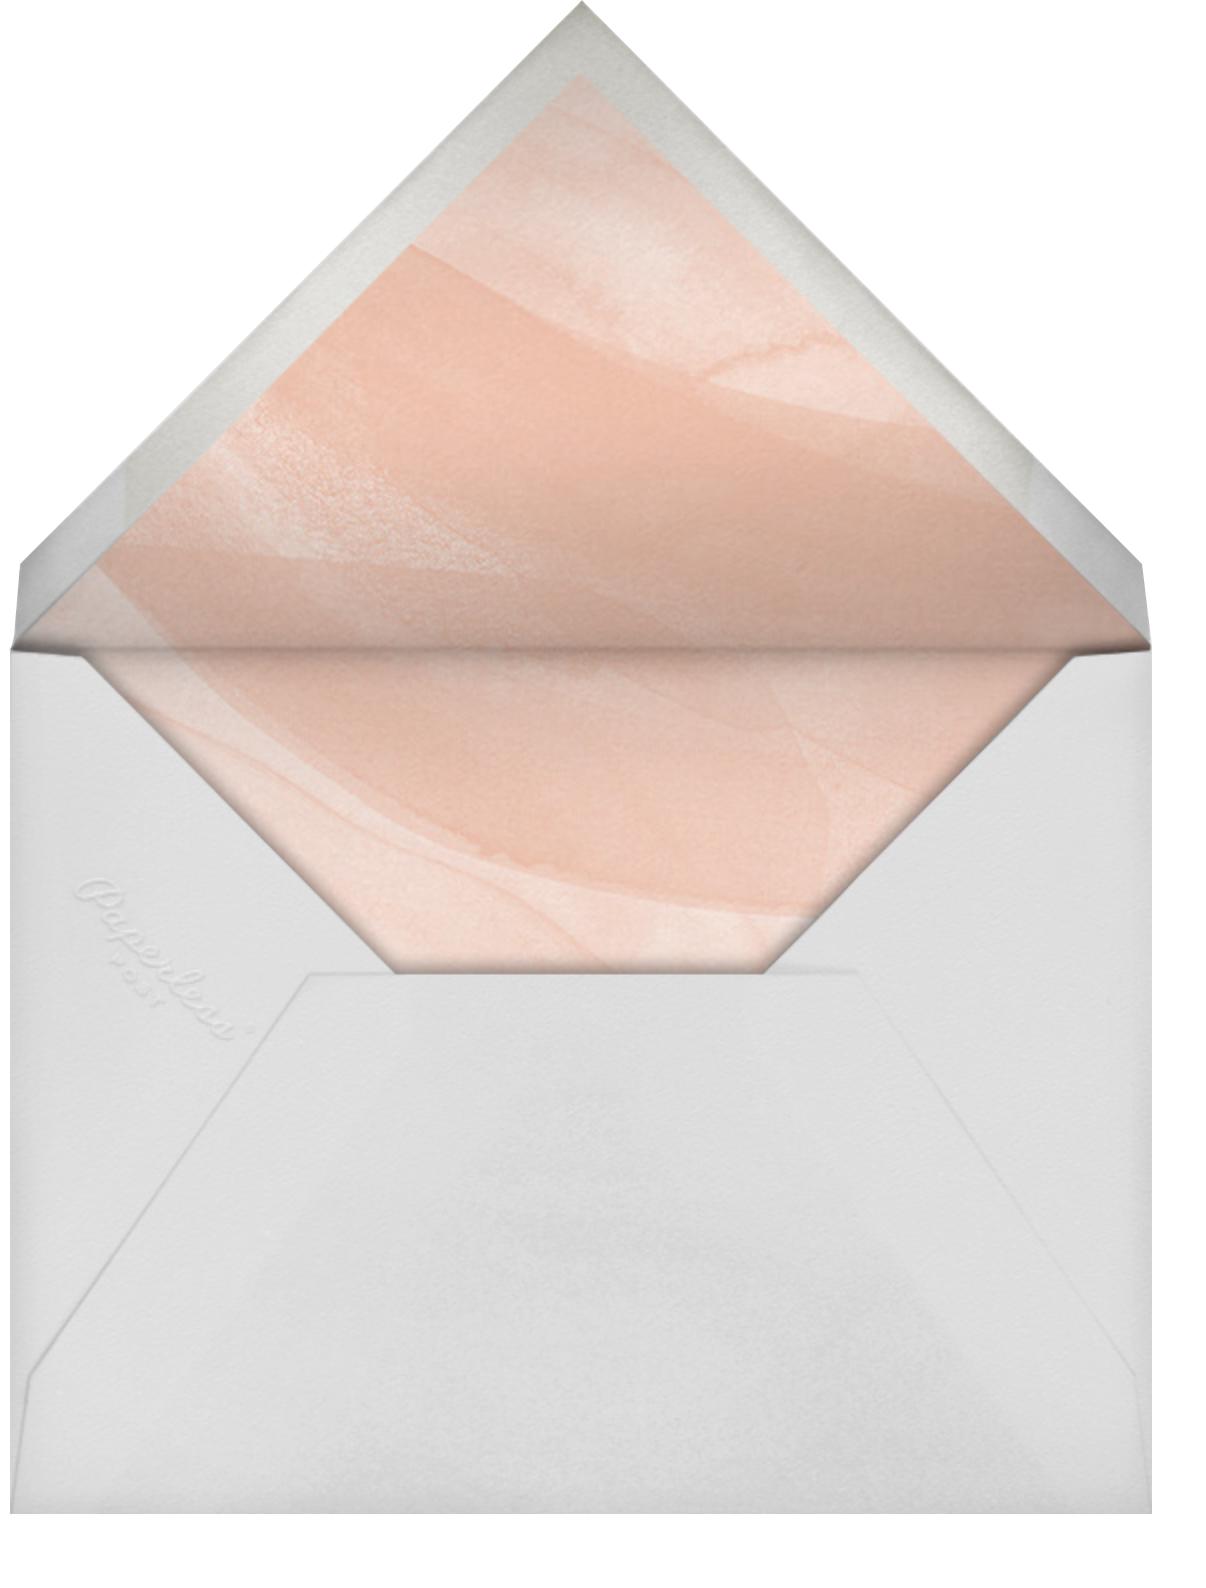 Epic Veil - Tan - Paperless Post - Envelope